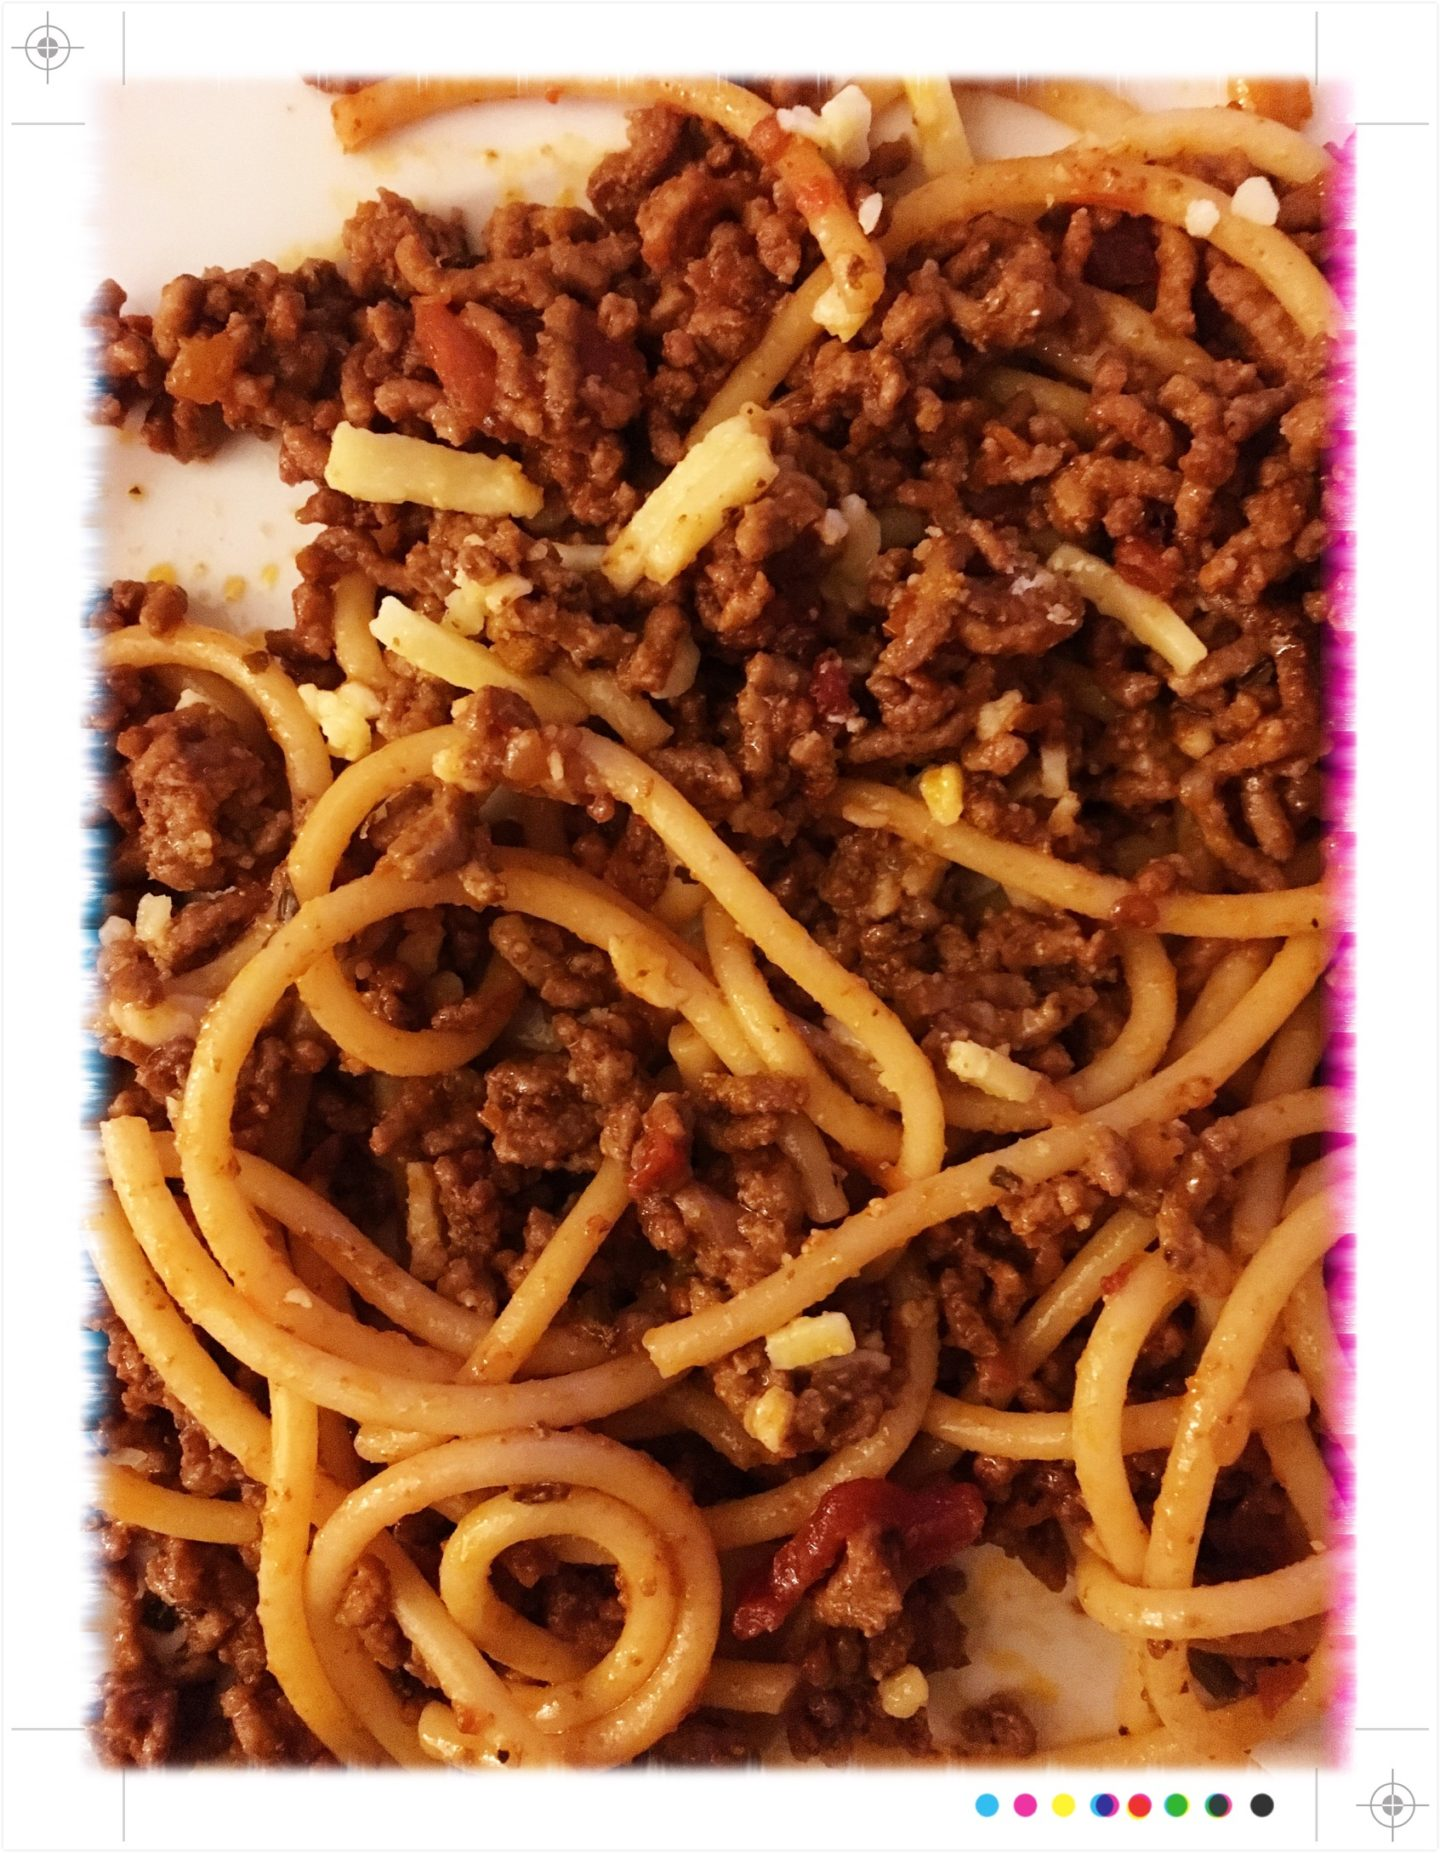 image of spaghetti bolognese